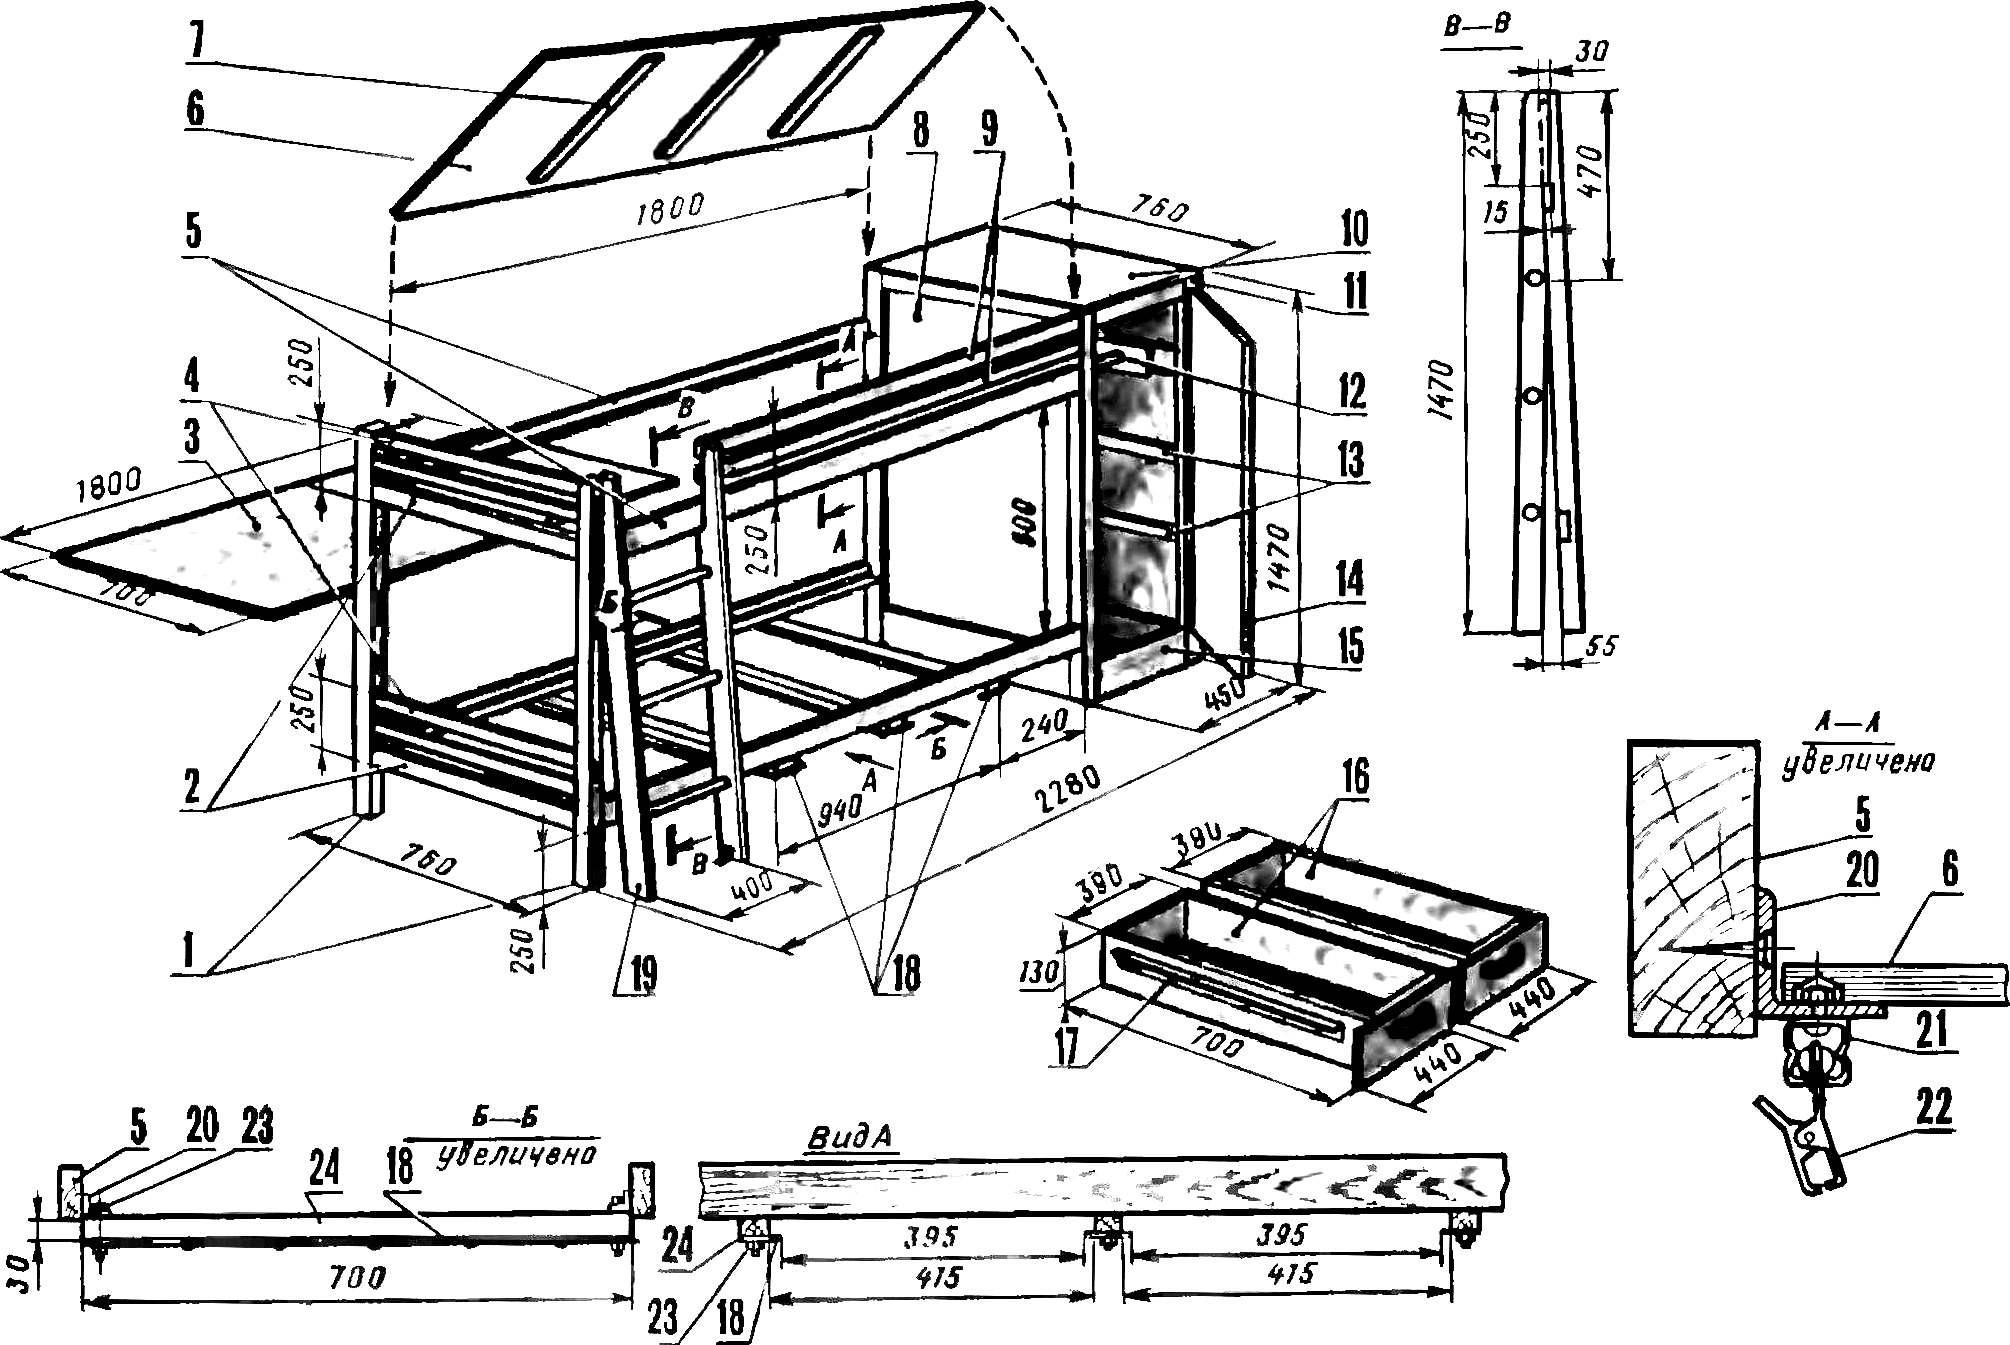 Fig. 1. Bunk bed.